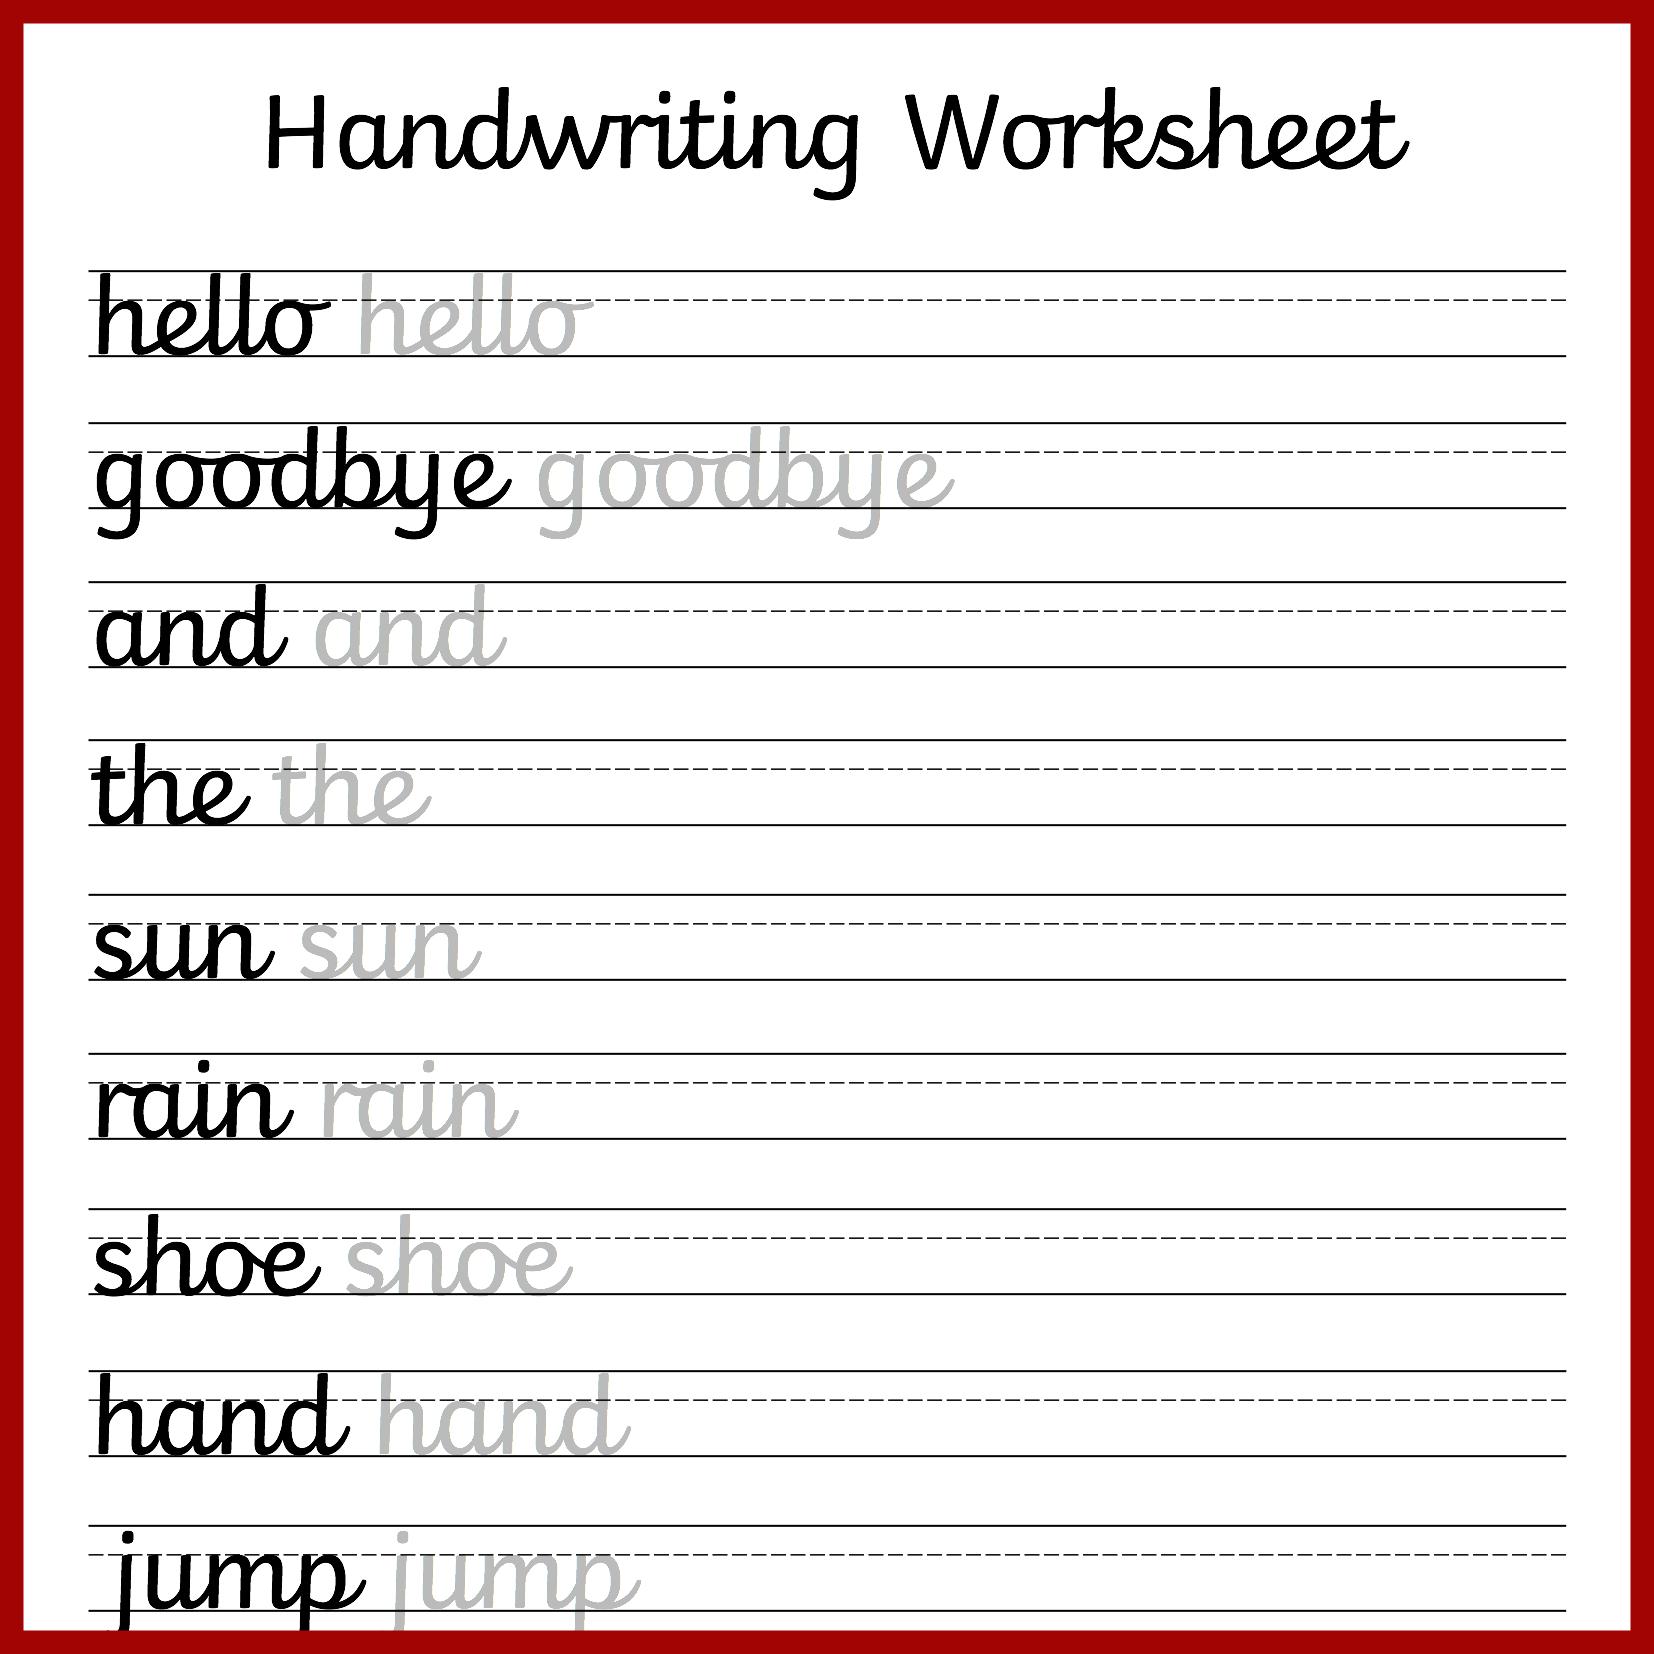 Cursive Handwriting Worksheets – Free Printable! ⋆ Mama Geek - Cursive Letters Worksheet Printable Free